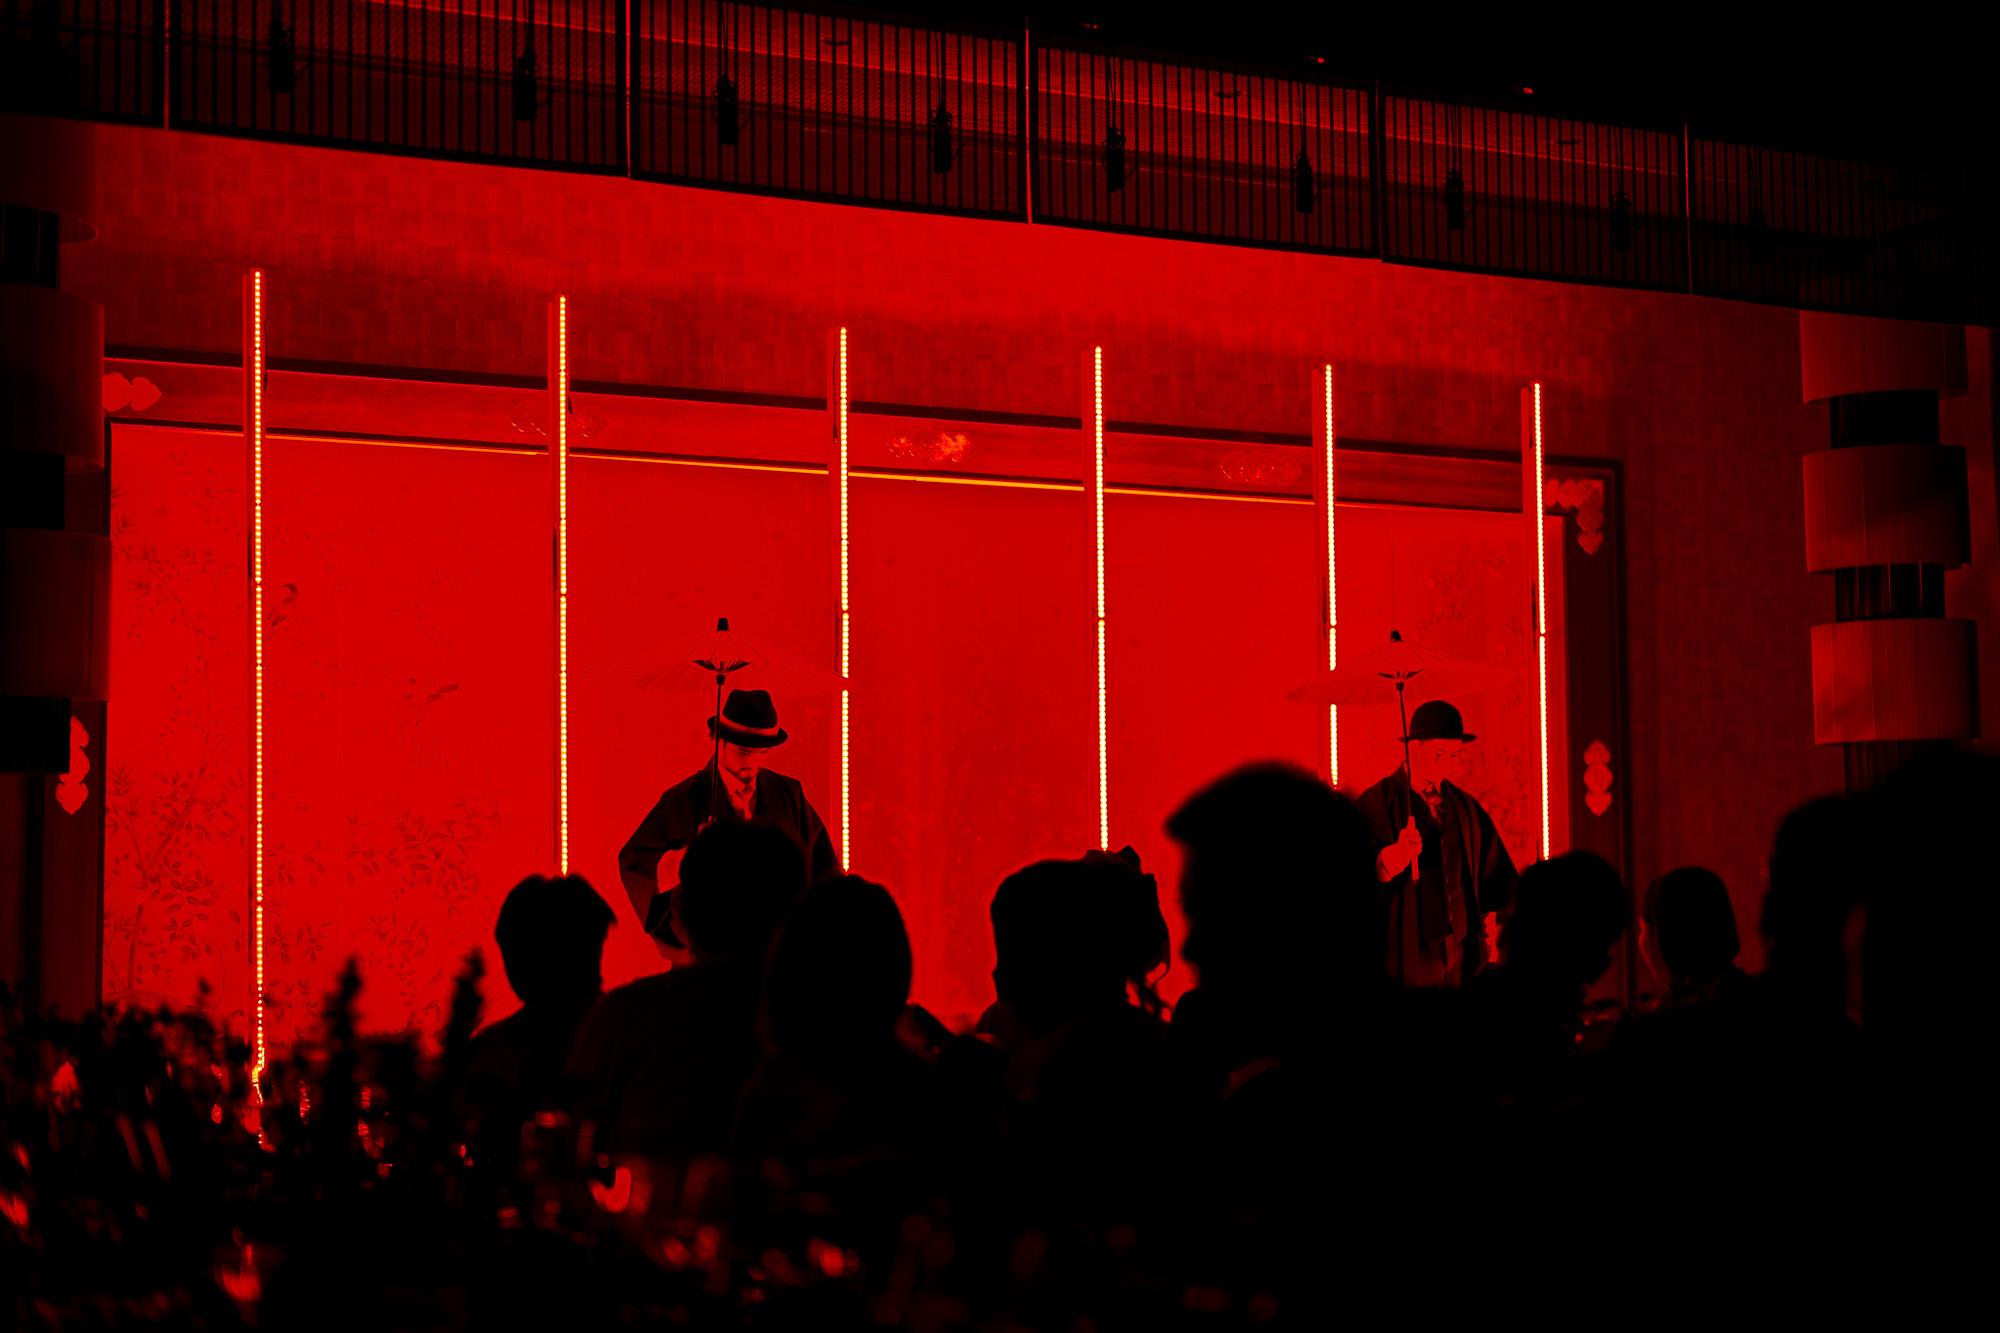 AUDEMARS PIGUET Le Brassus 2020.10.02 Audemars Piguet Nagoya Grand Opening Party オーデマピゲ ディナー百花籠 hyakkarou 愛知 名古屋 Alto e Diritto アルトエデリット ロイヤルオーク ロイヤルオークオフショア スイス ジュウ渓谷 オープニングパーティー オーデマピゲブティック名古屋